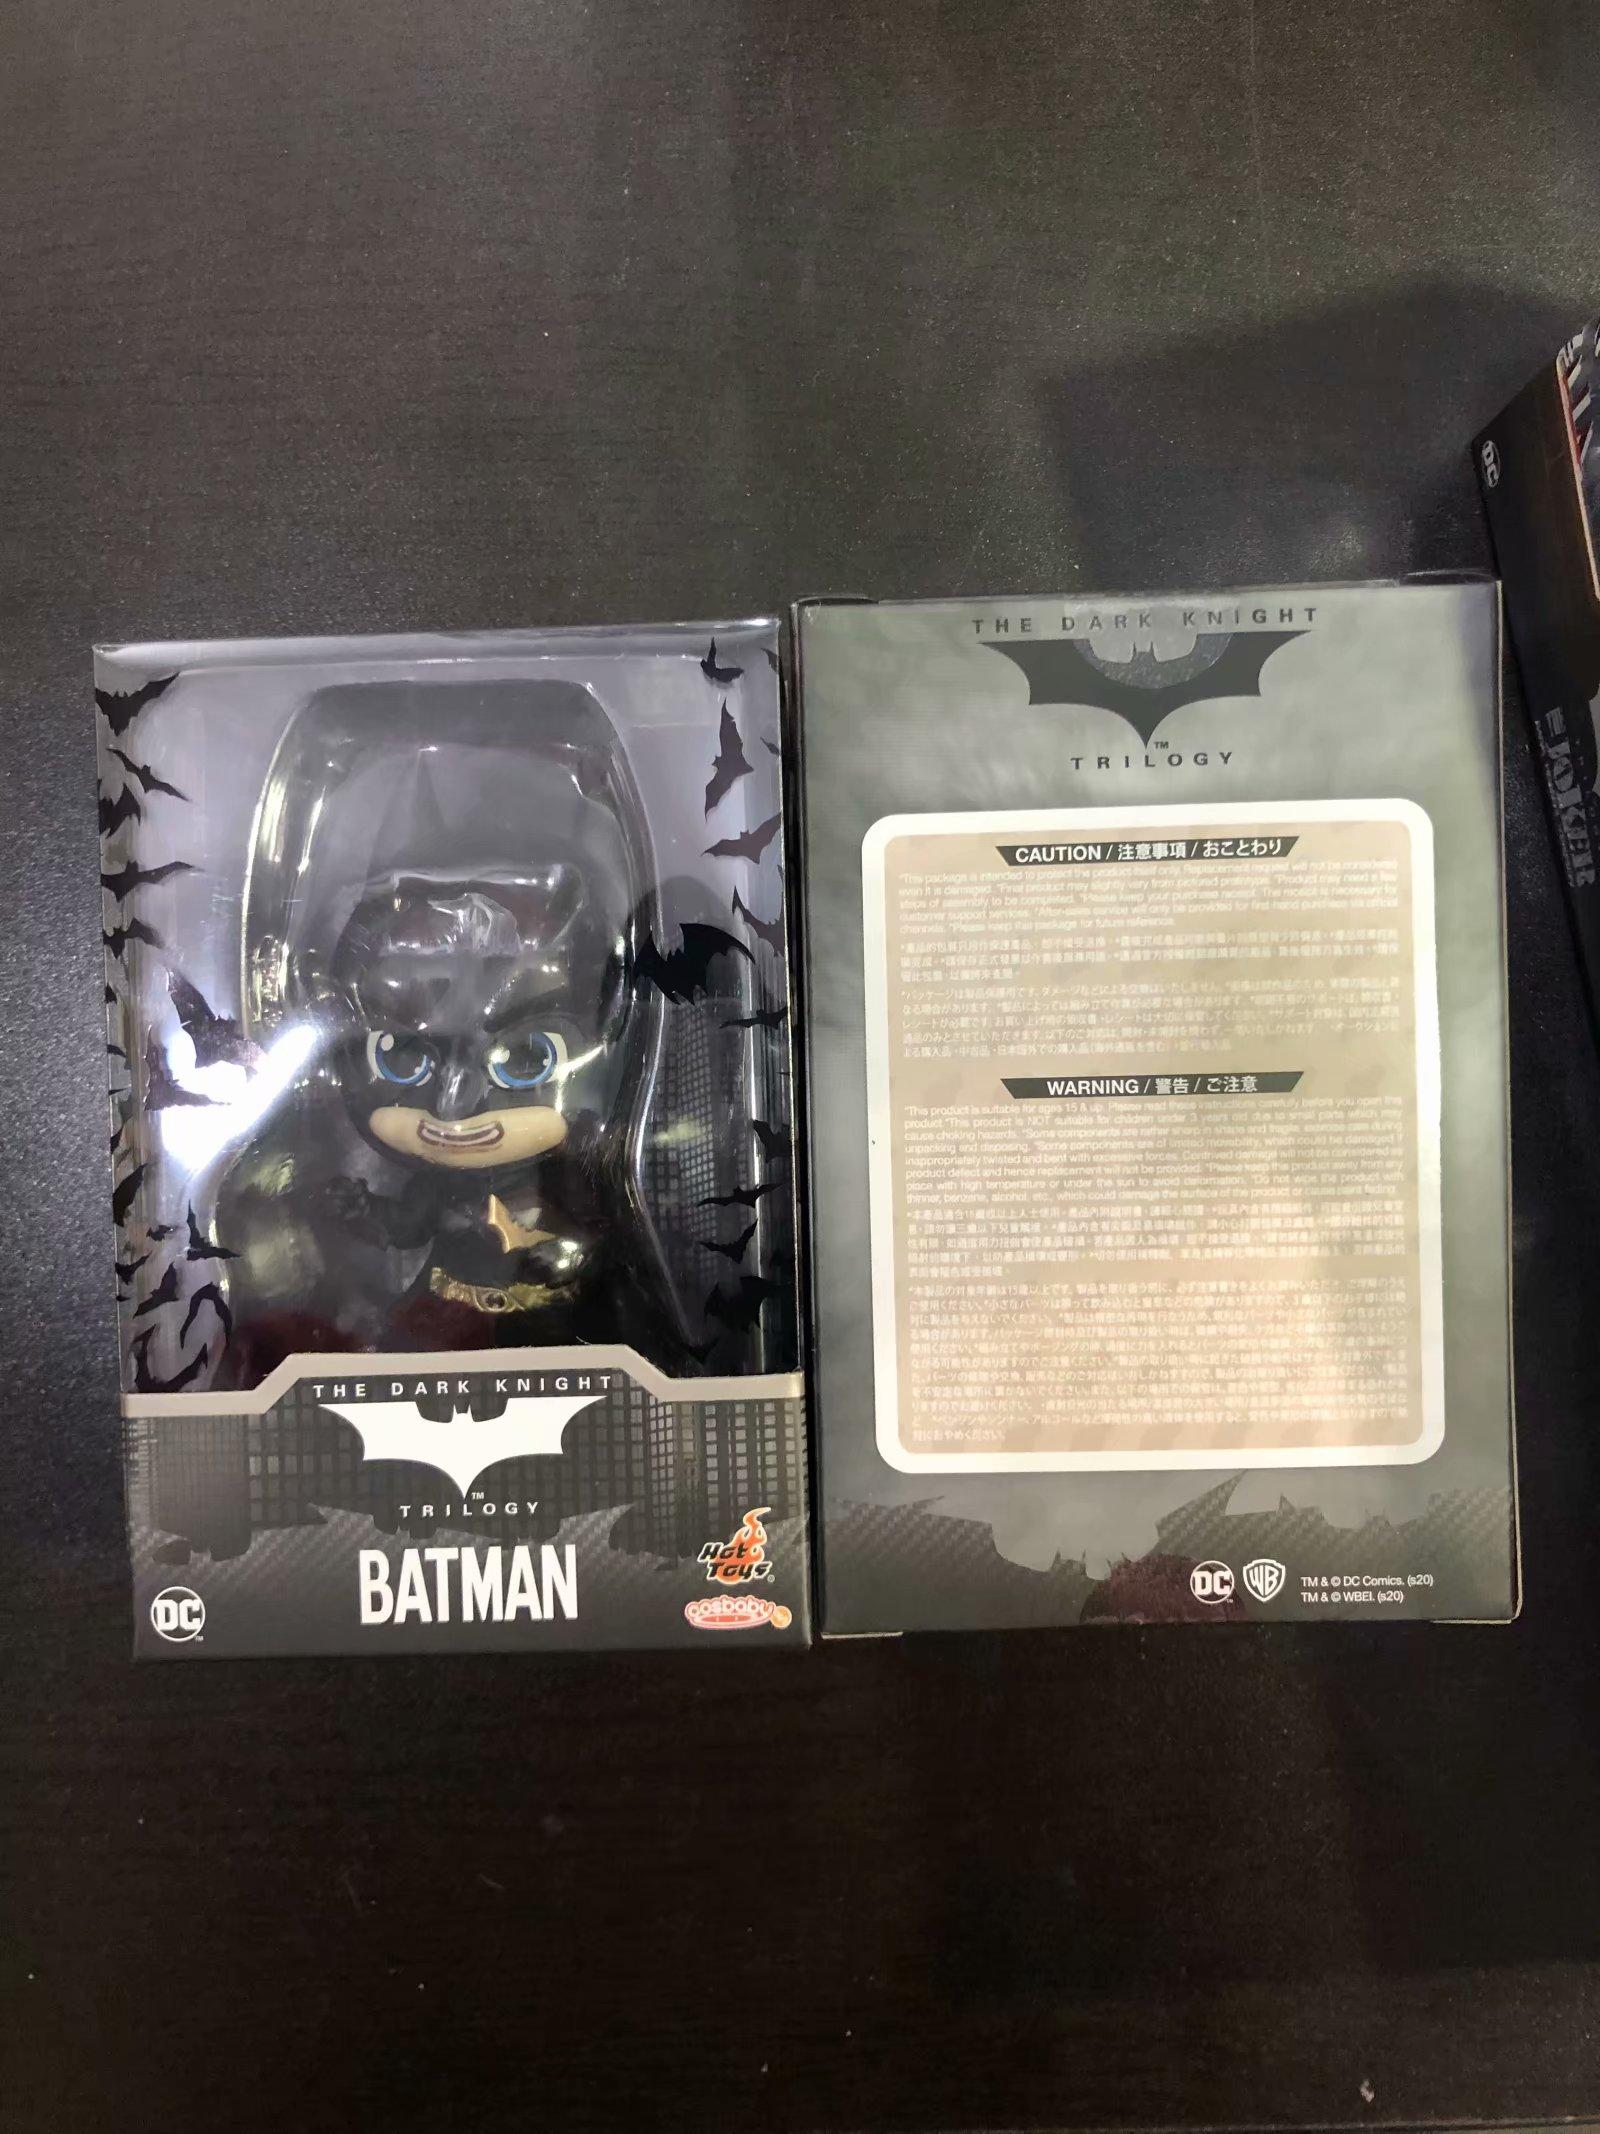 HT/Hottoys COSB721 DC蝙蝠侠 黑暗骑士 cosbaby 现货